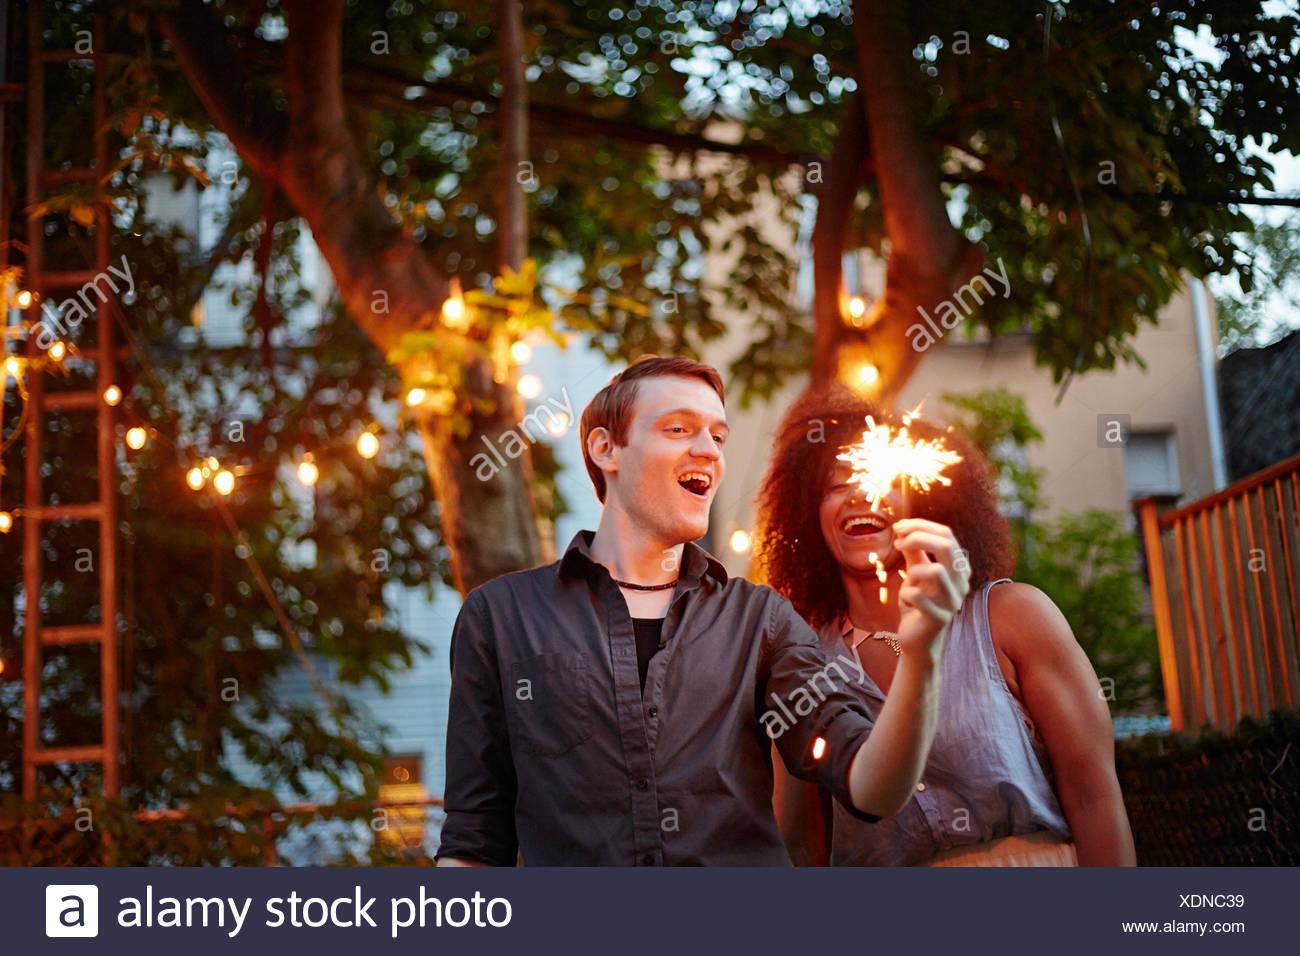 Joven la celebración de bengala en garden party Imagen De Stock